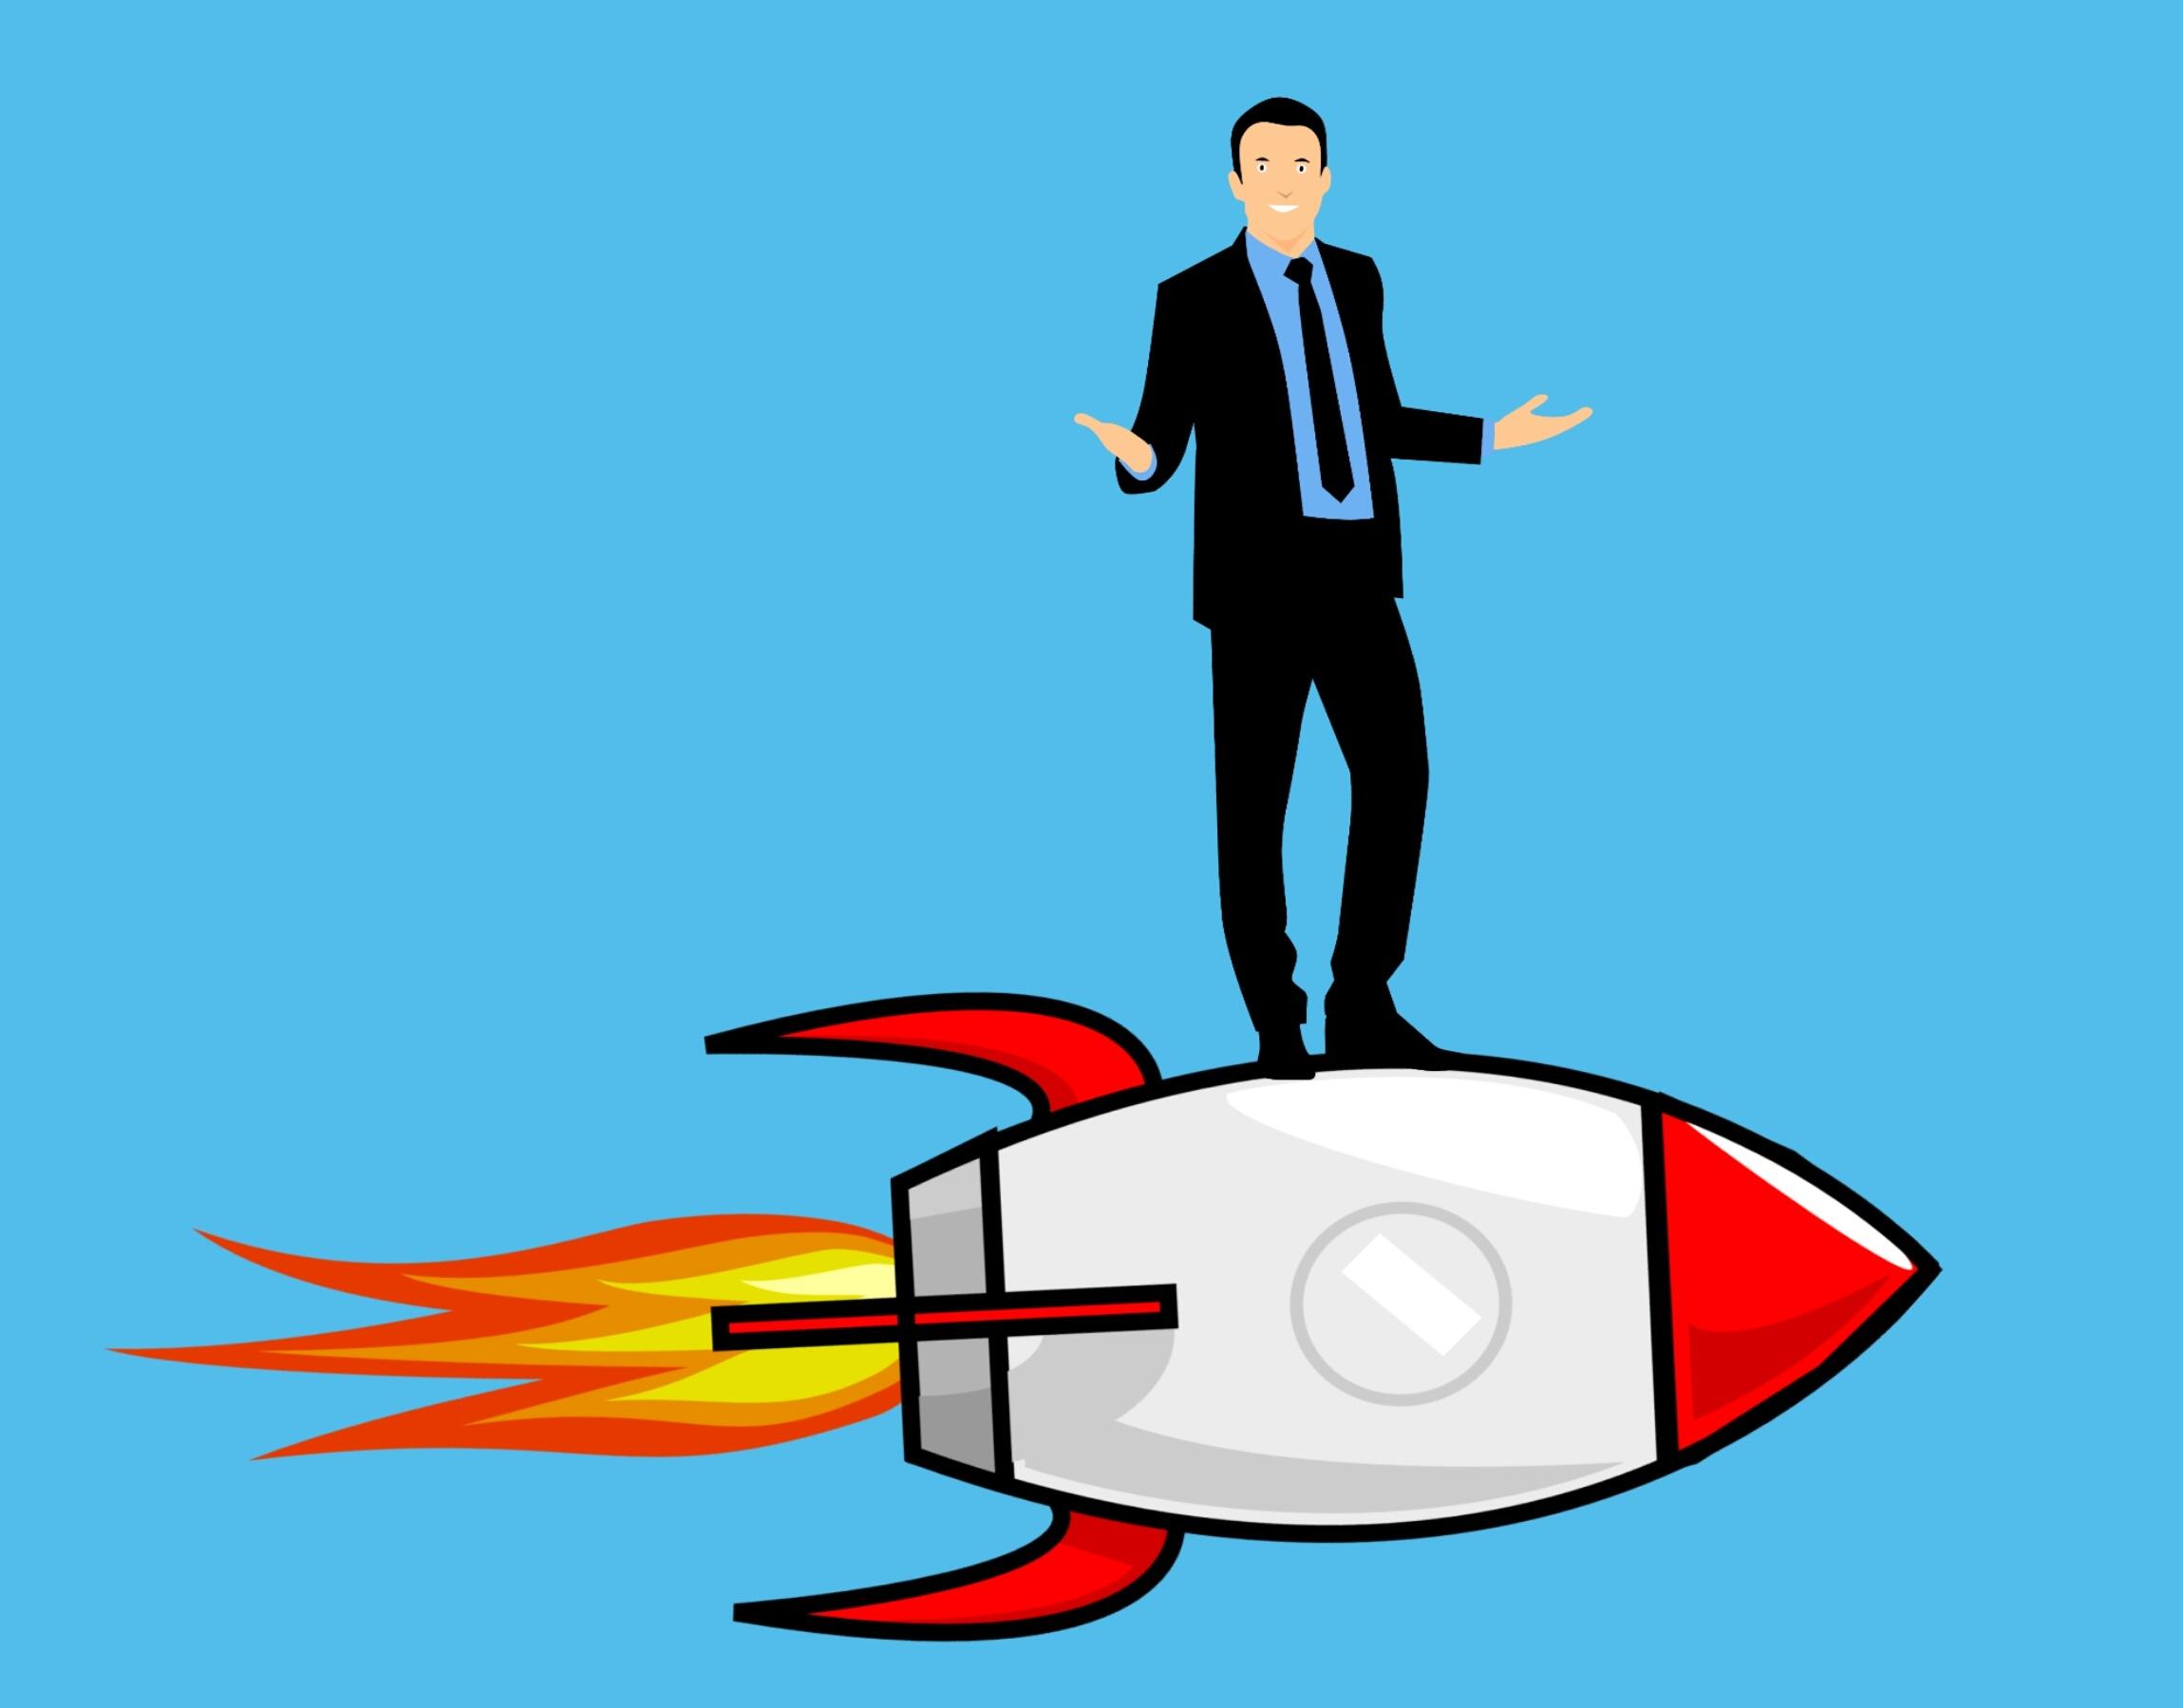 Free Images : entrepreneur, business, rocket, start up, career ladder, rise, social, top, abyss ...